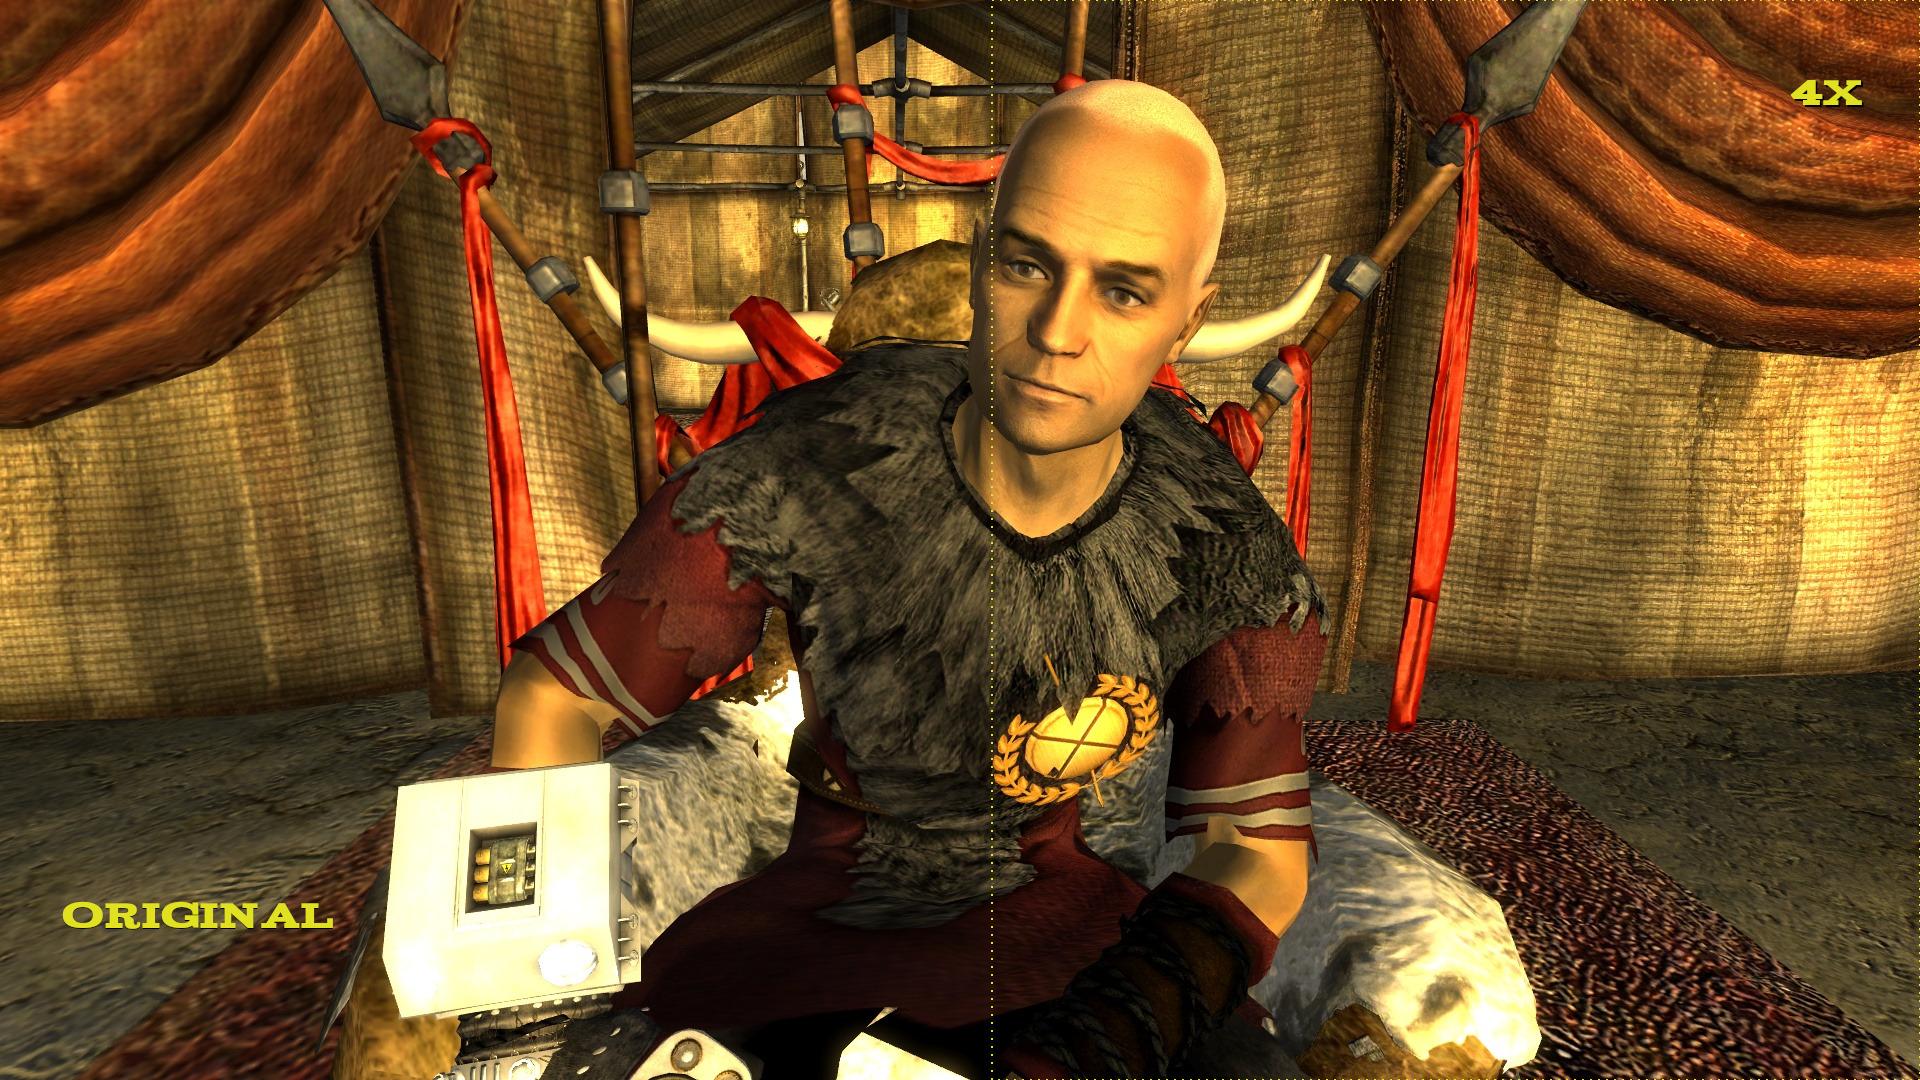 AI-enhanced HD Texture Pack - Fallout: New Vegas